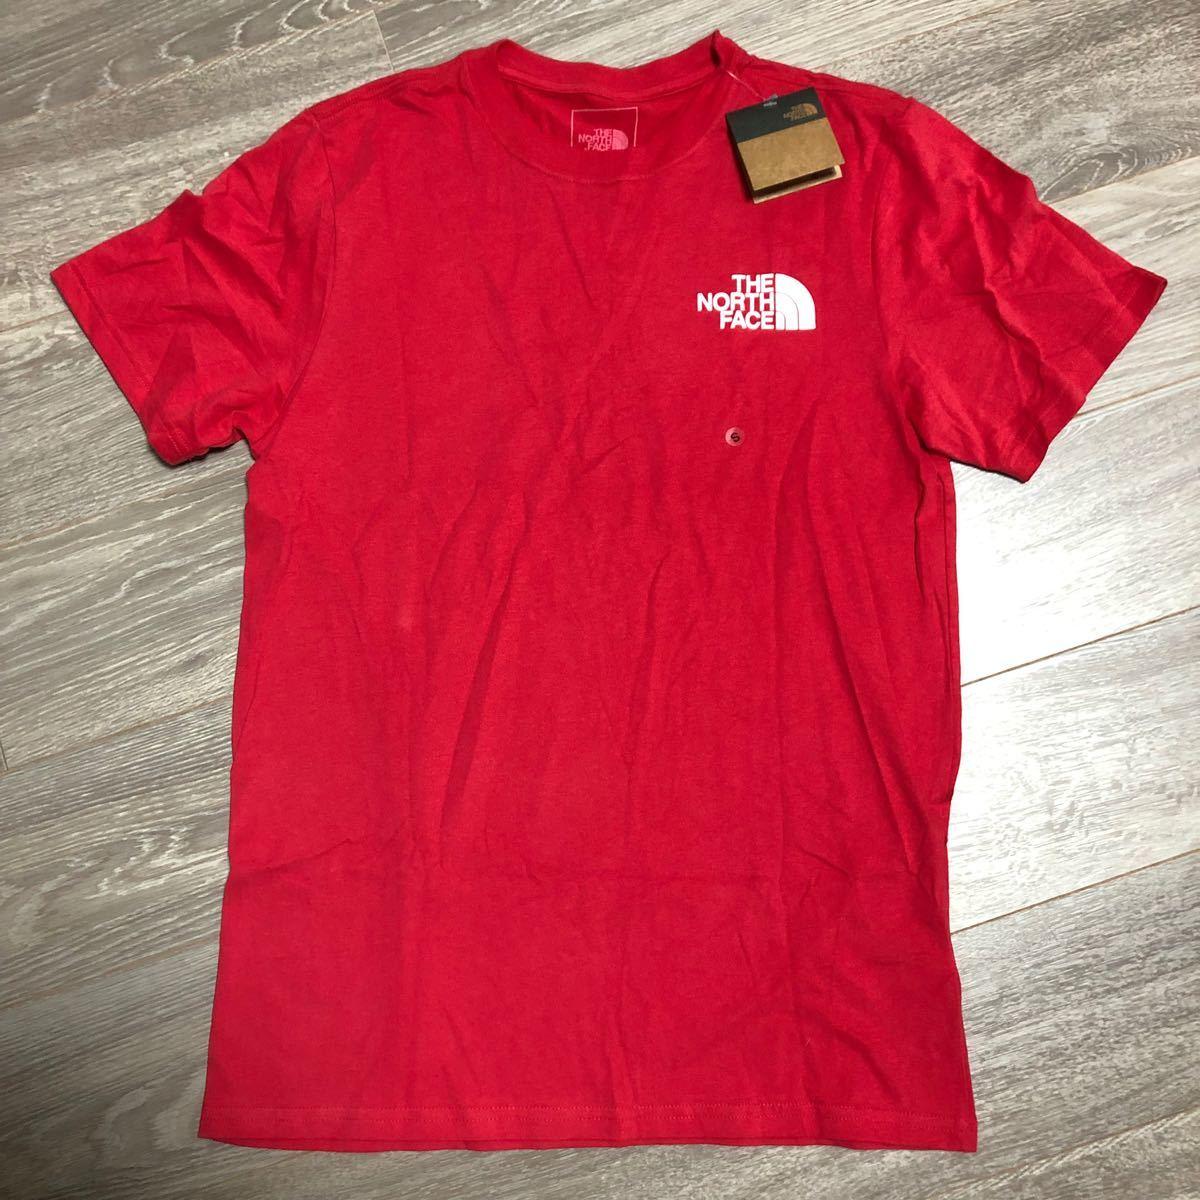 THE NORTH FACE ノースフェイスTシャツ ザノースフェイス 半袖Tシャツ